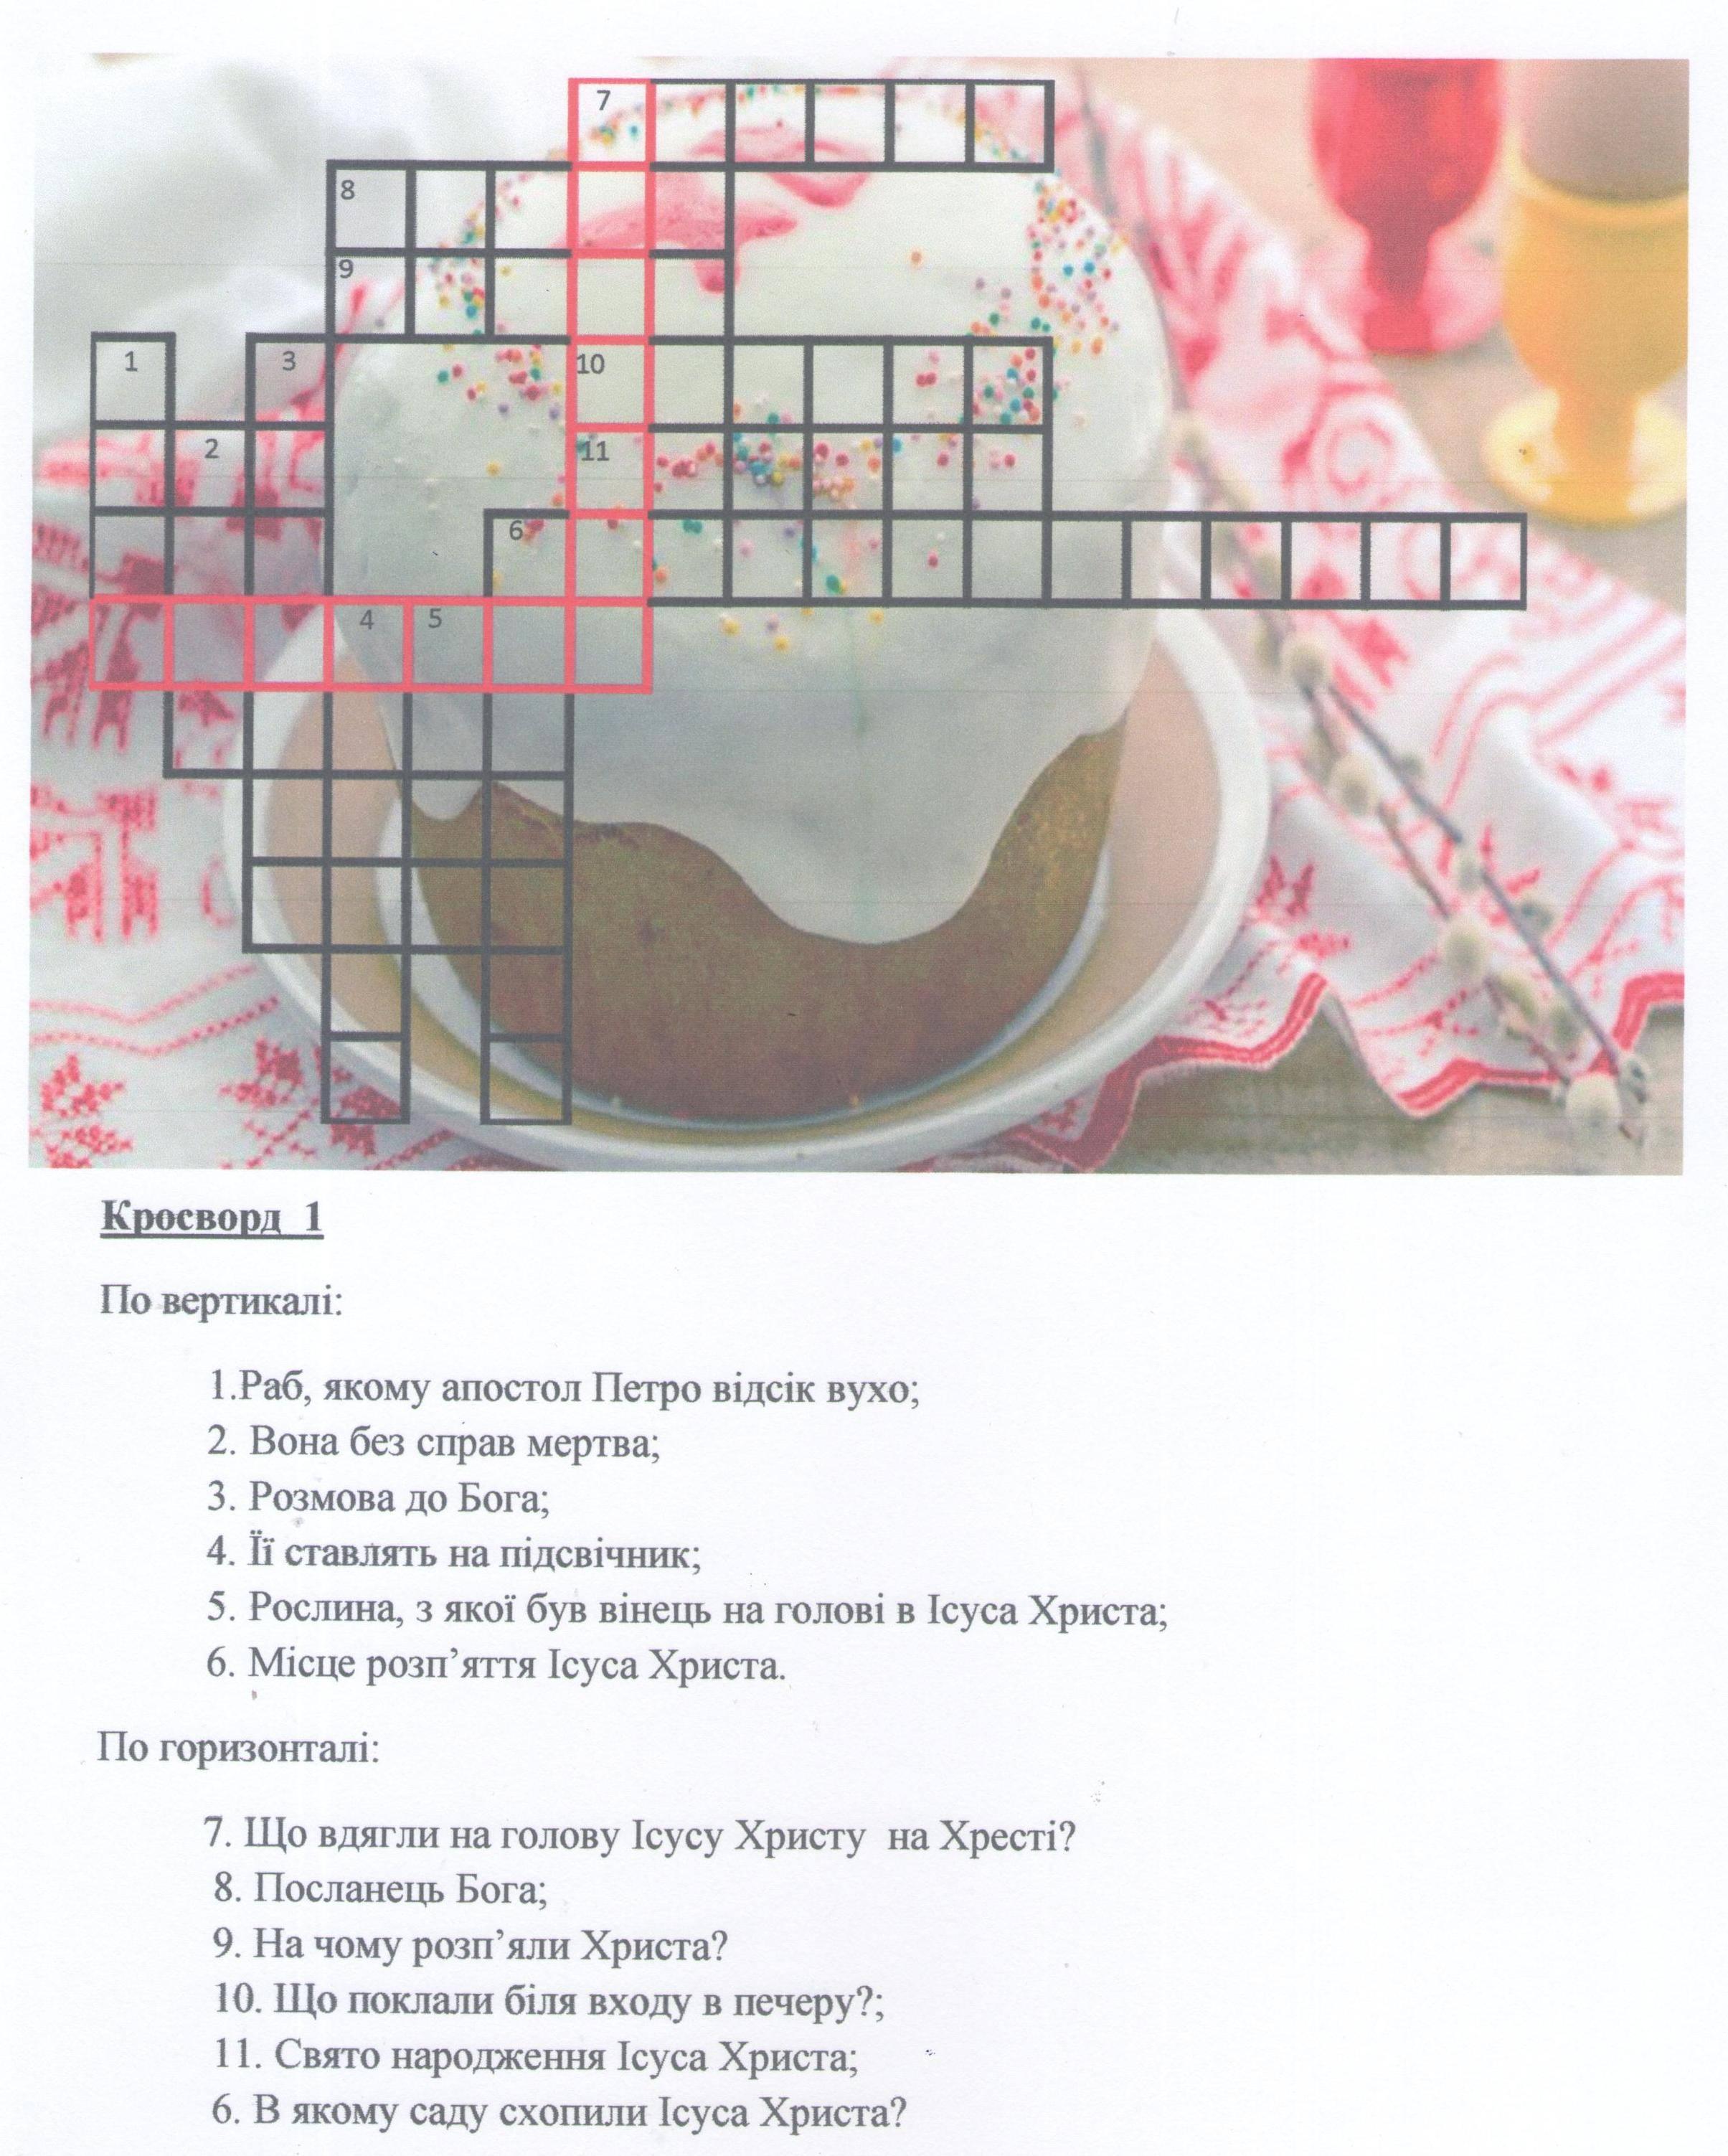 Шишкин К., Павленко А., Масакова В.